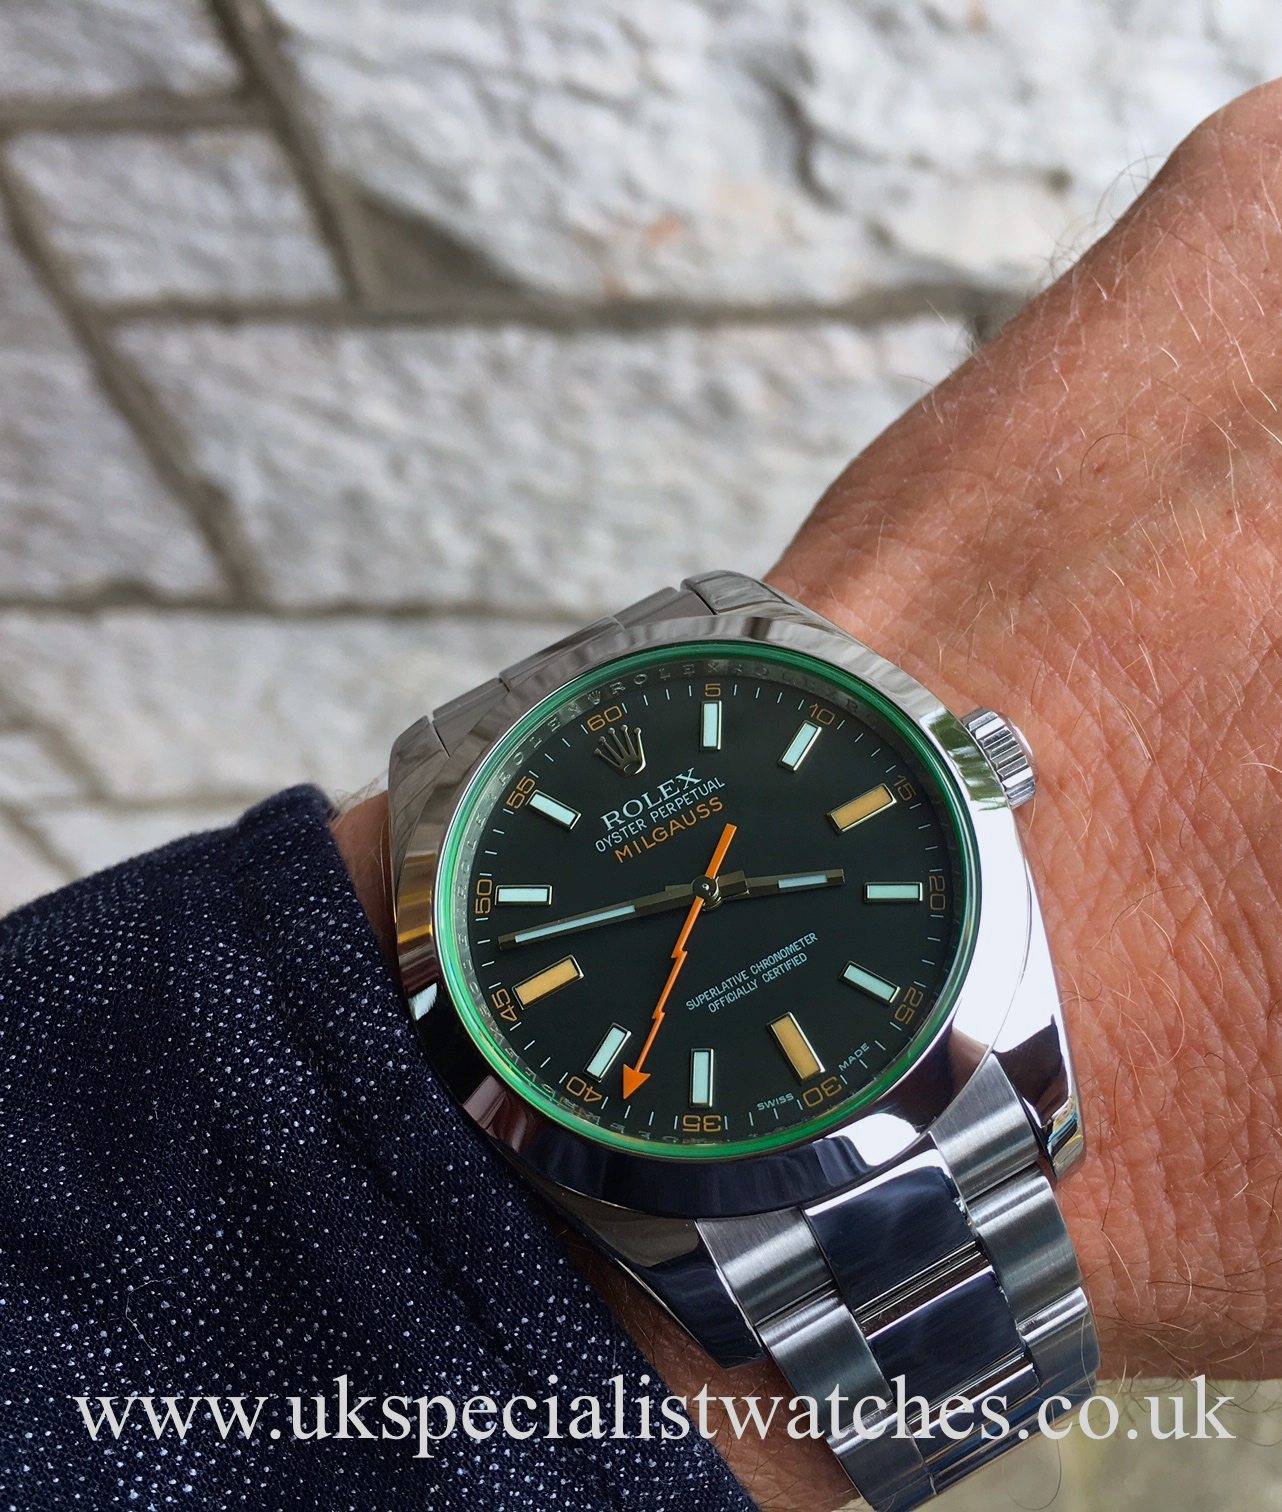 Rolex milgauss green sapphire crystal glass 40mm 116400gv uk specialist watches for Rolex milgauss